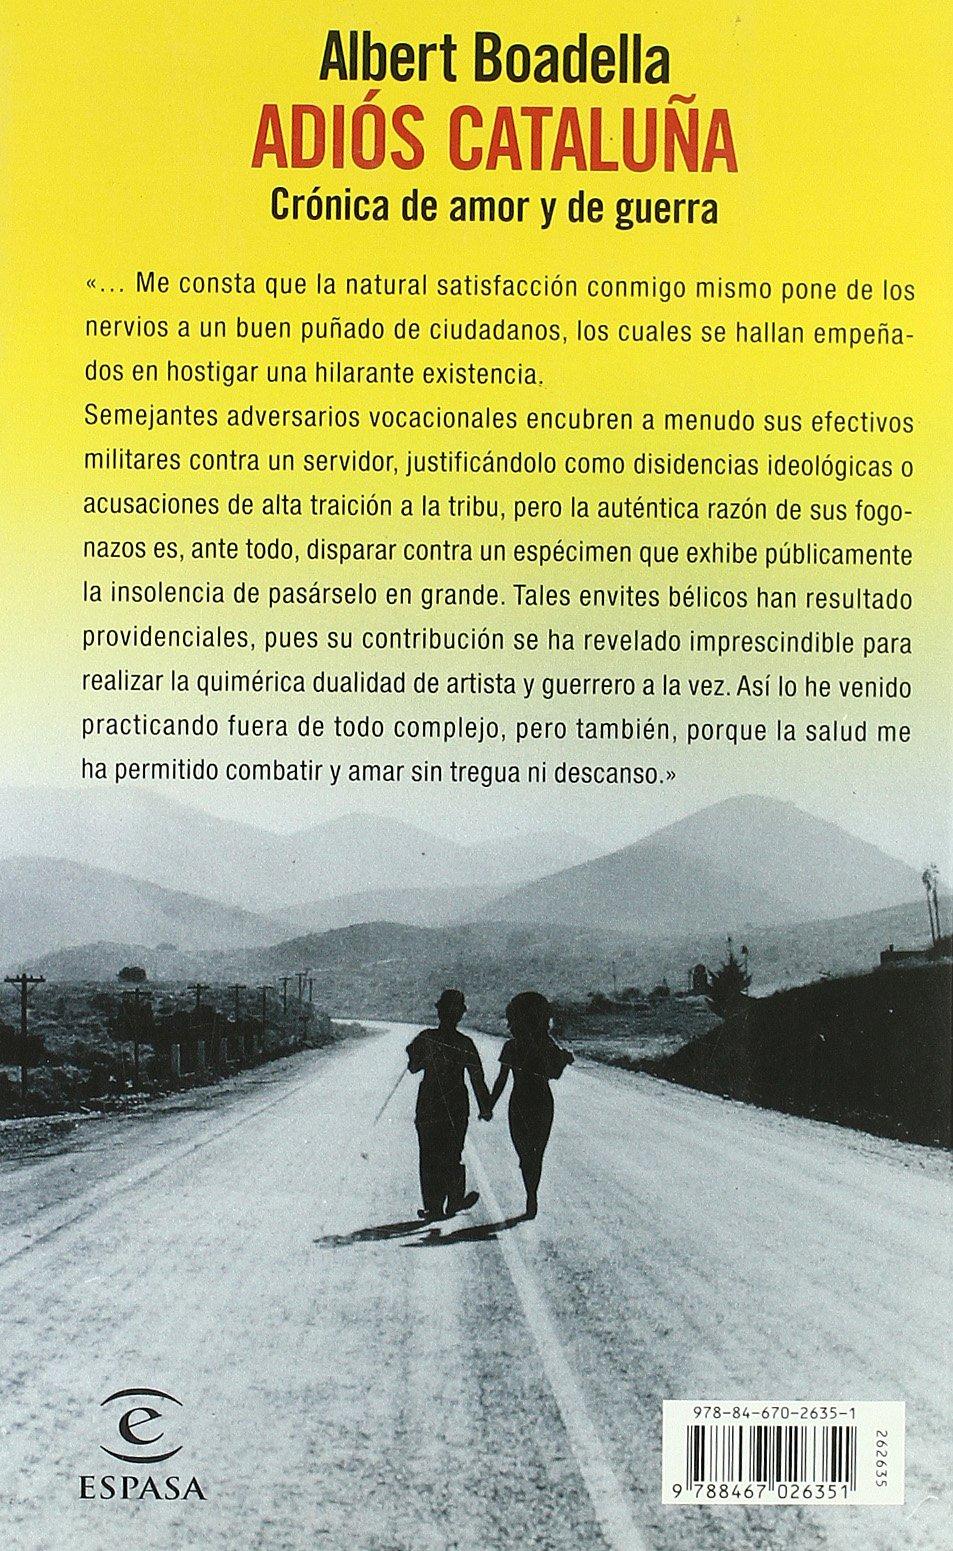 Adiós, Cataluña (ESPASA HOY): Amazon.es: Boadella, Albert: Libros